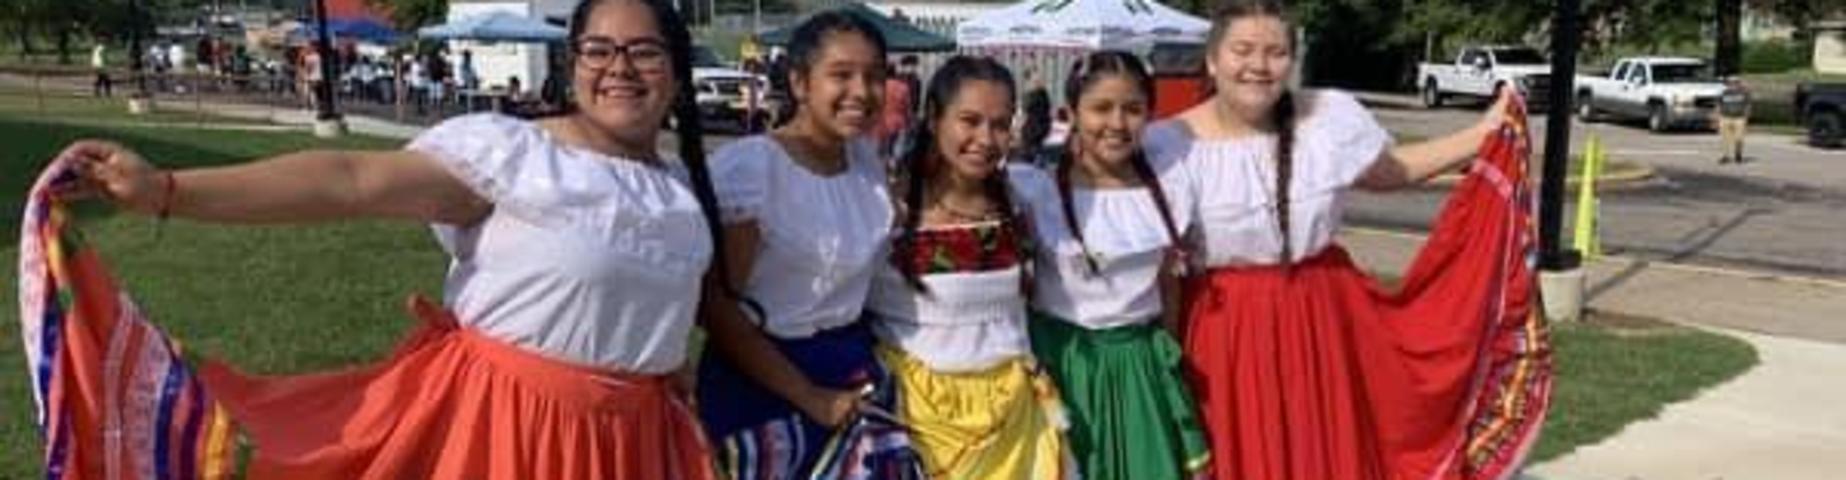 Celebrating Hispanic Heritage Month at Mayfield High School!!